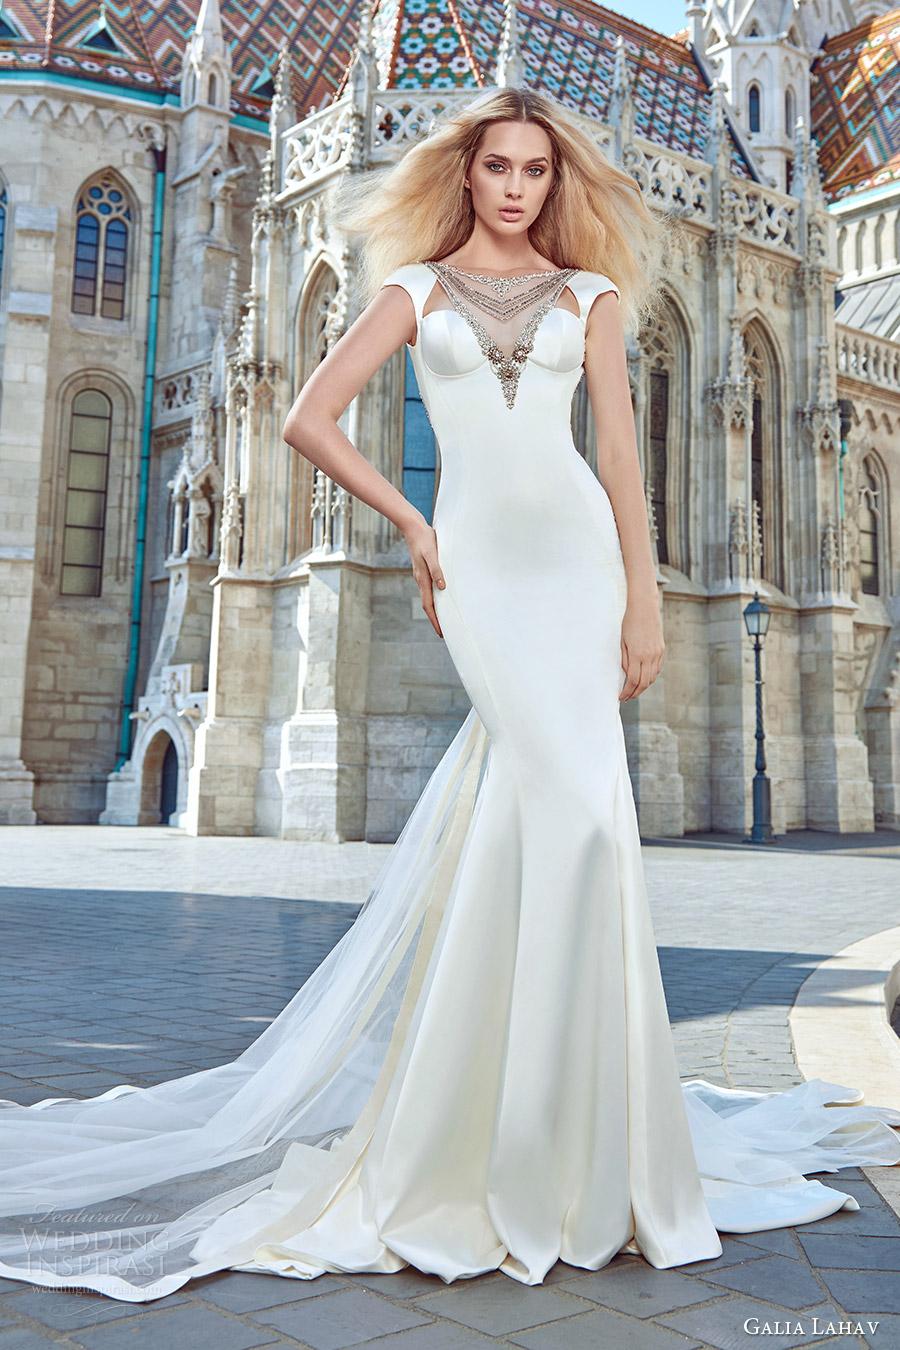 galia lahav fall 2016 bridal cap sleeve illusion boat neckline embellished neck cutout trumpet wedding dress (juliana) modern glam mv